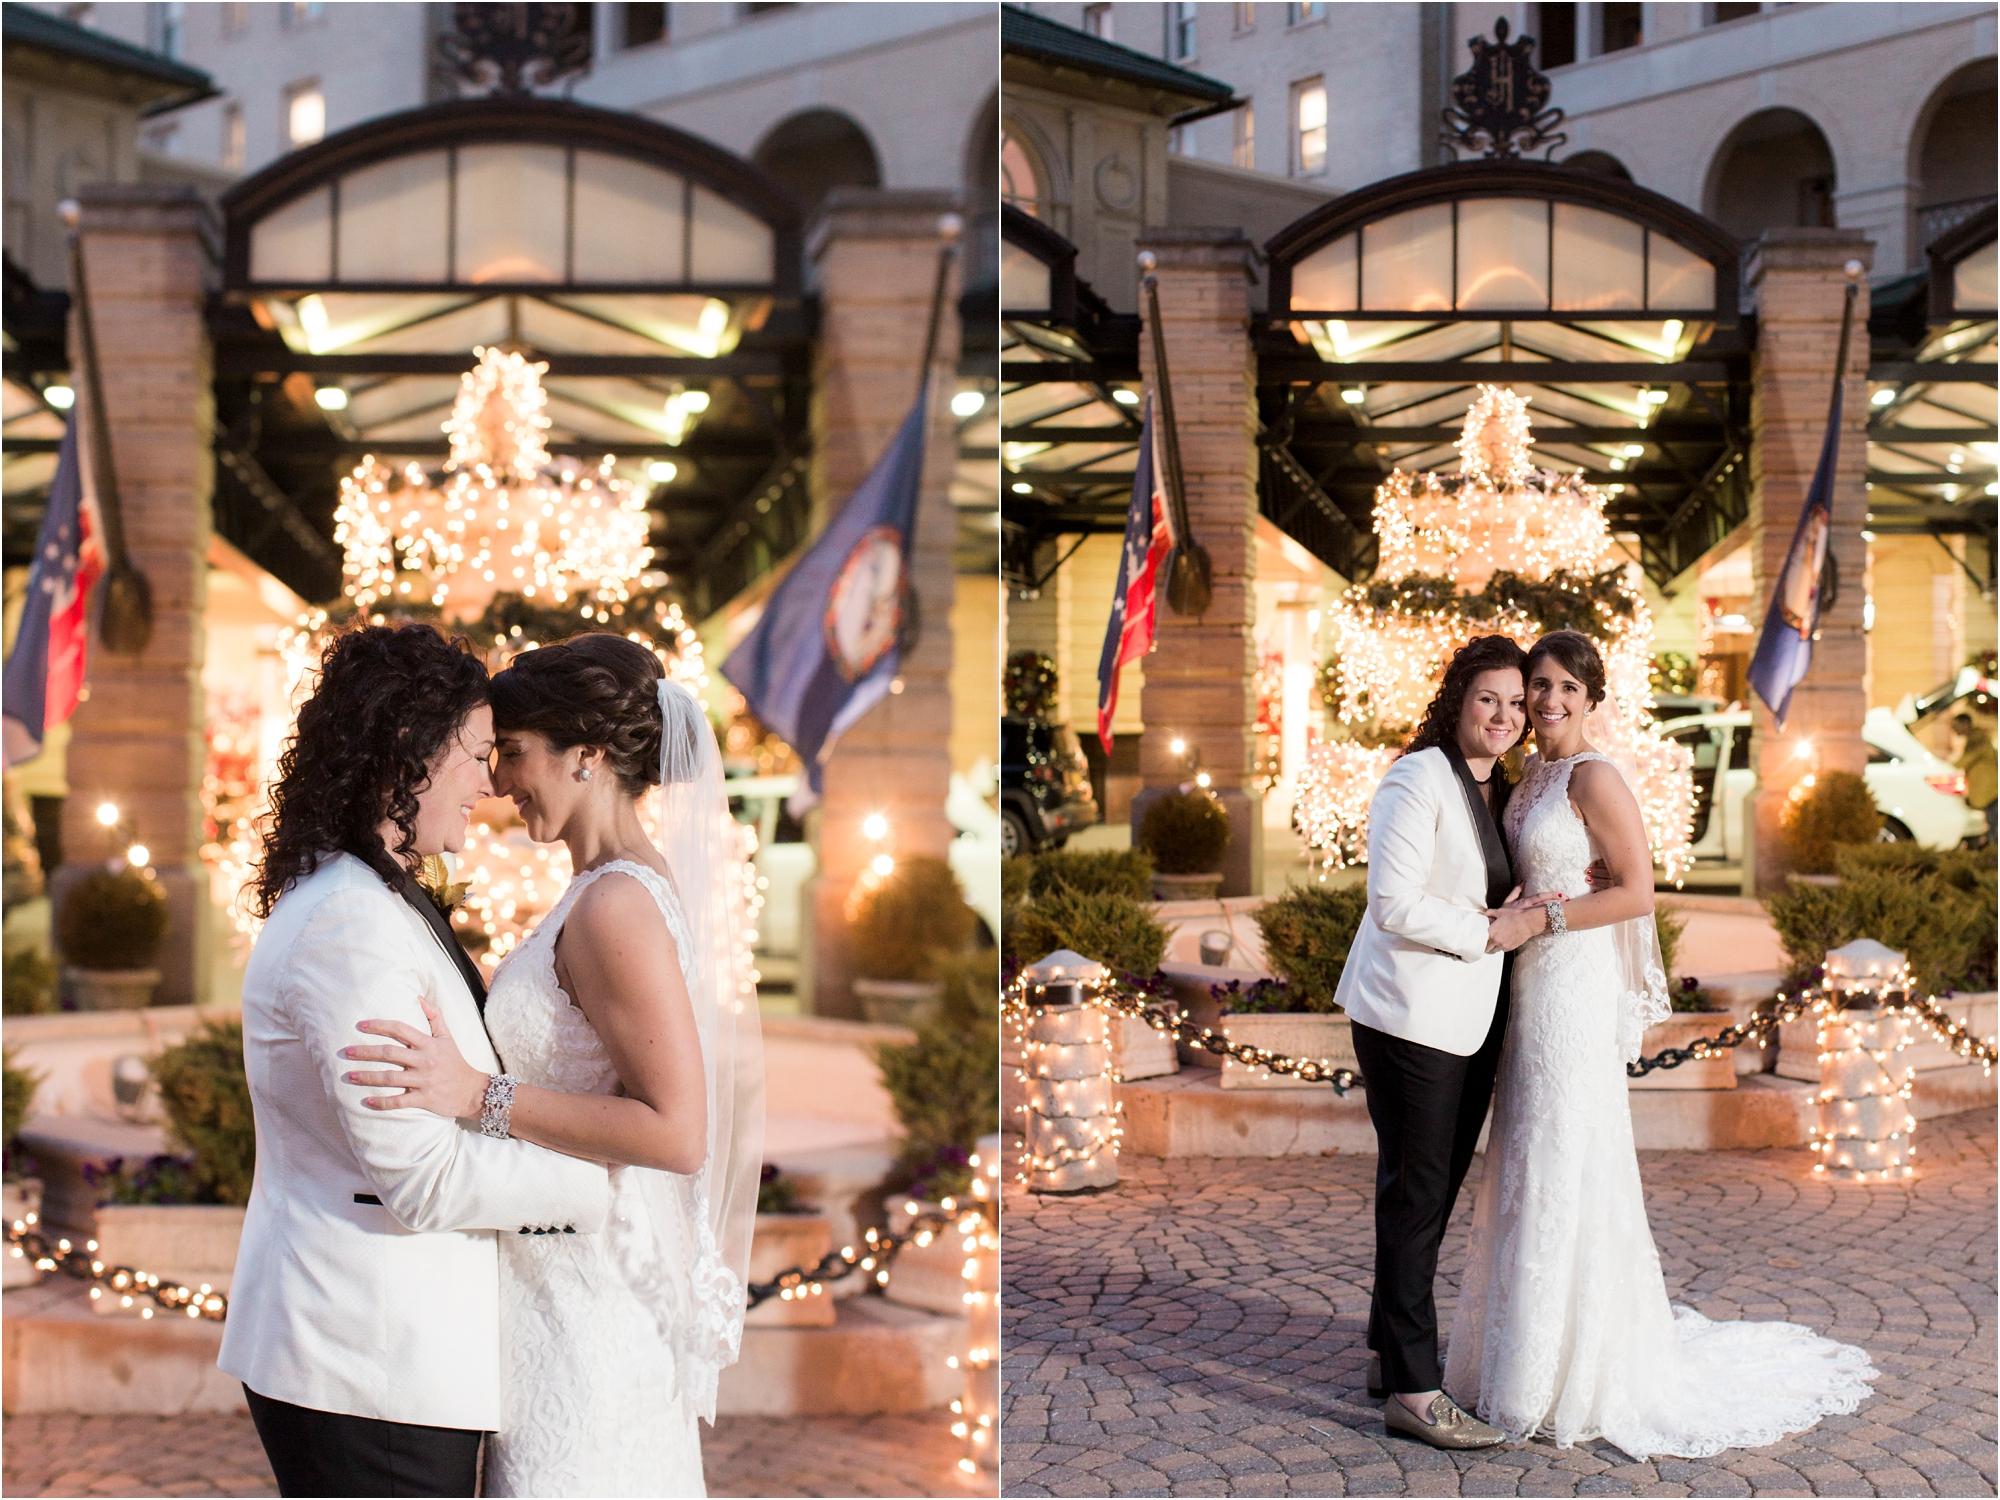 phoebe-mayme-richmond-virginia-colorful-love-is-love-wedding-photos_0008b.JPG